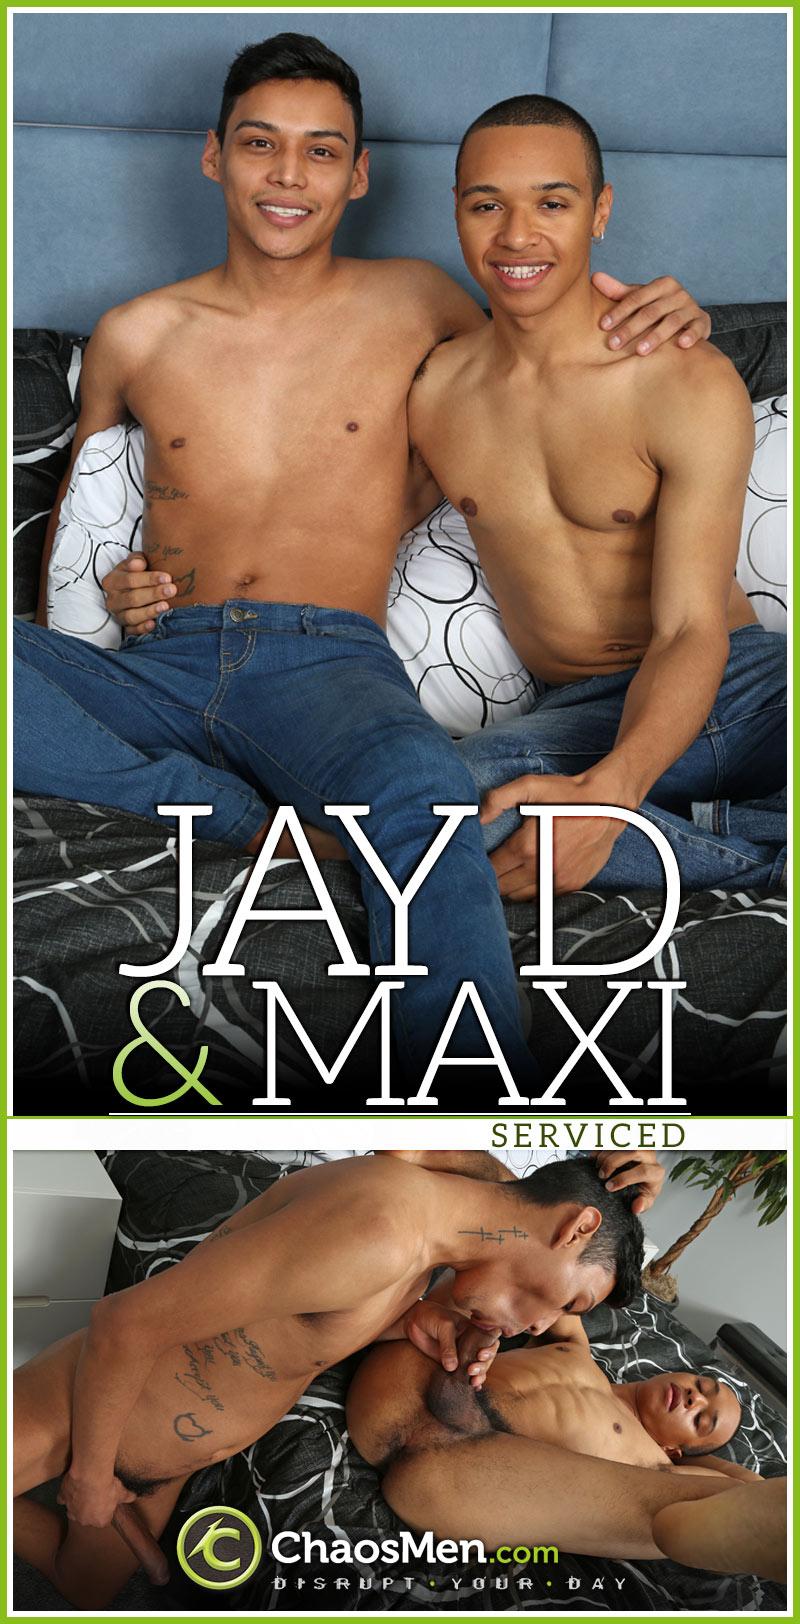 Jay D & Maxi [Serviced] at ChaosMen